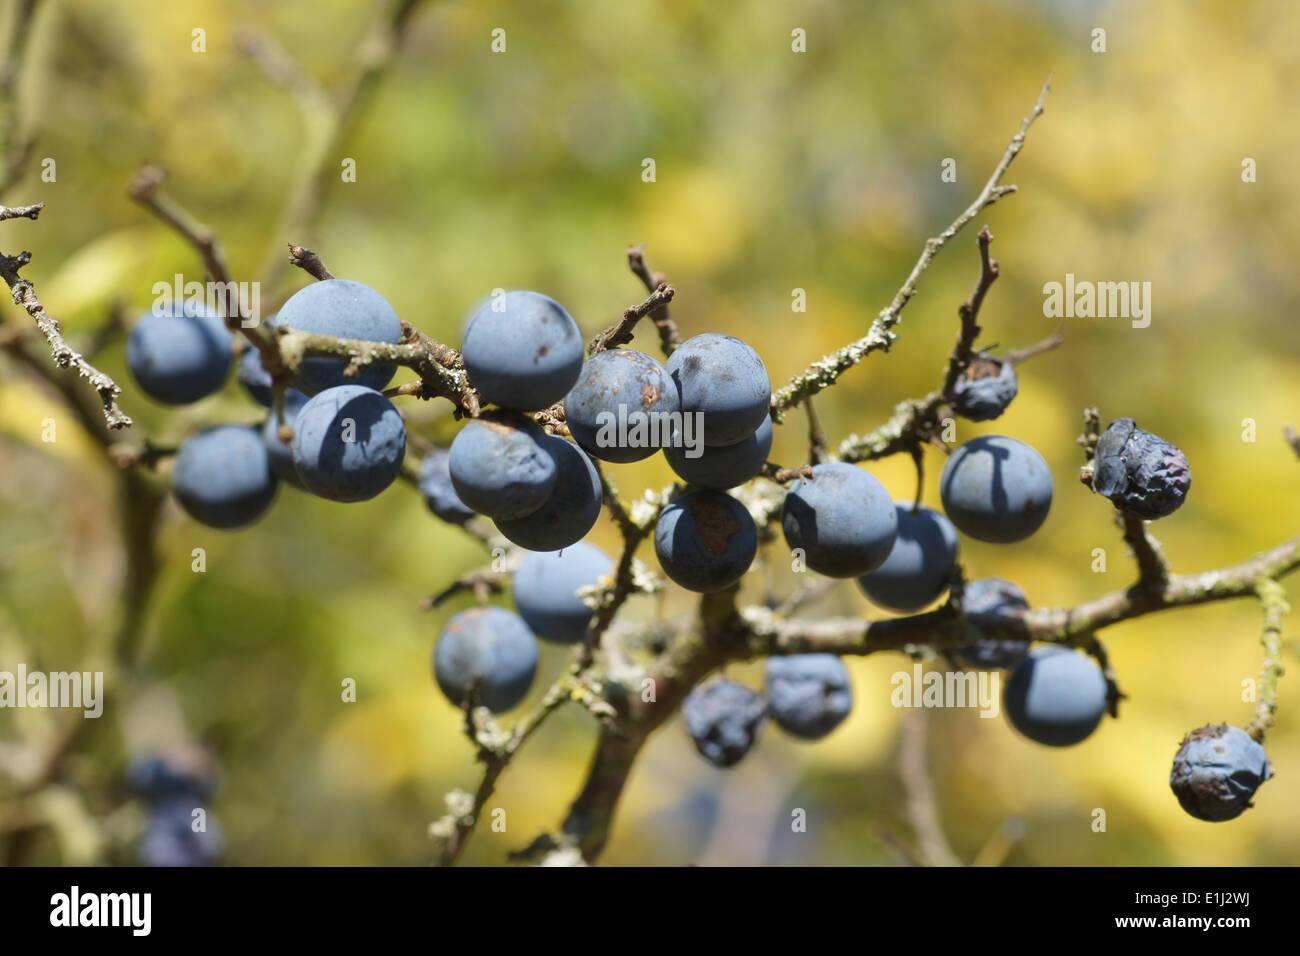 Blackthorn - Stock Image